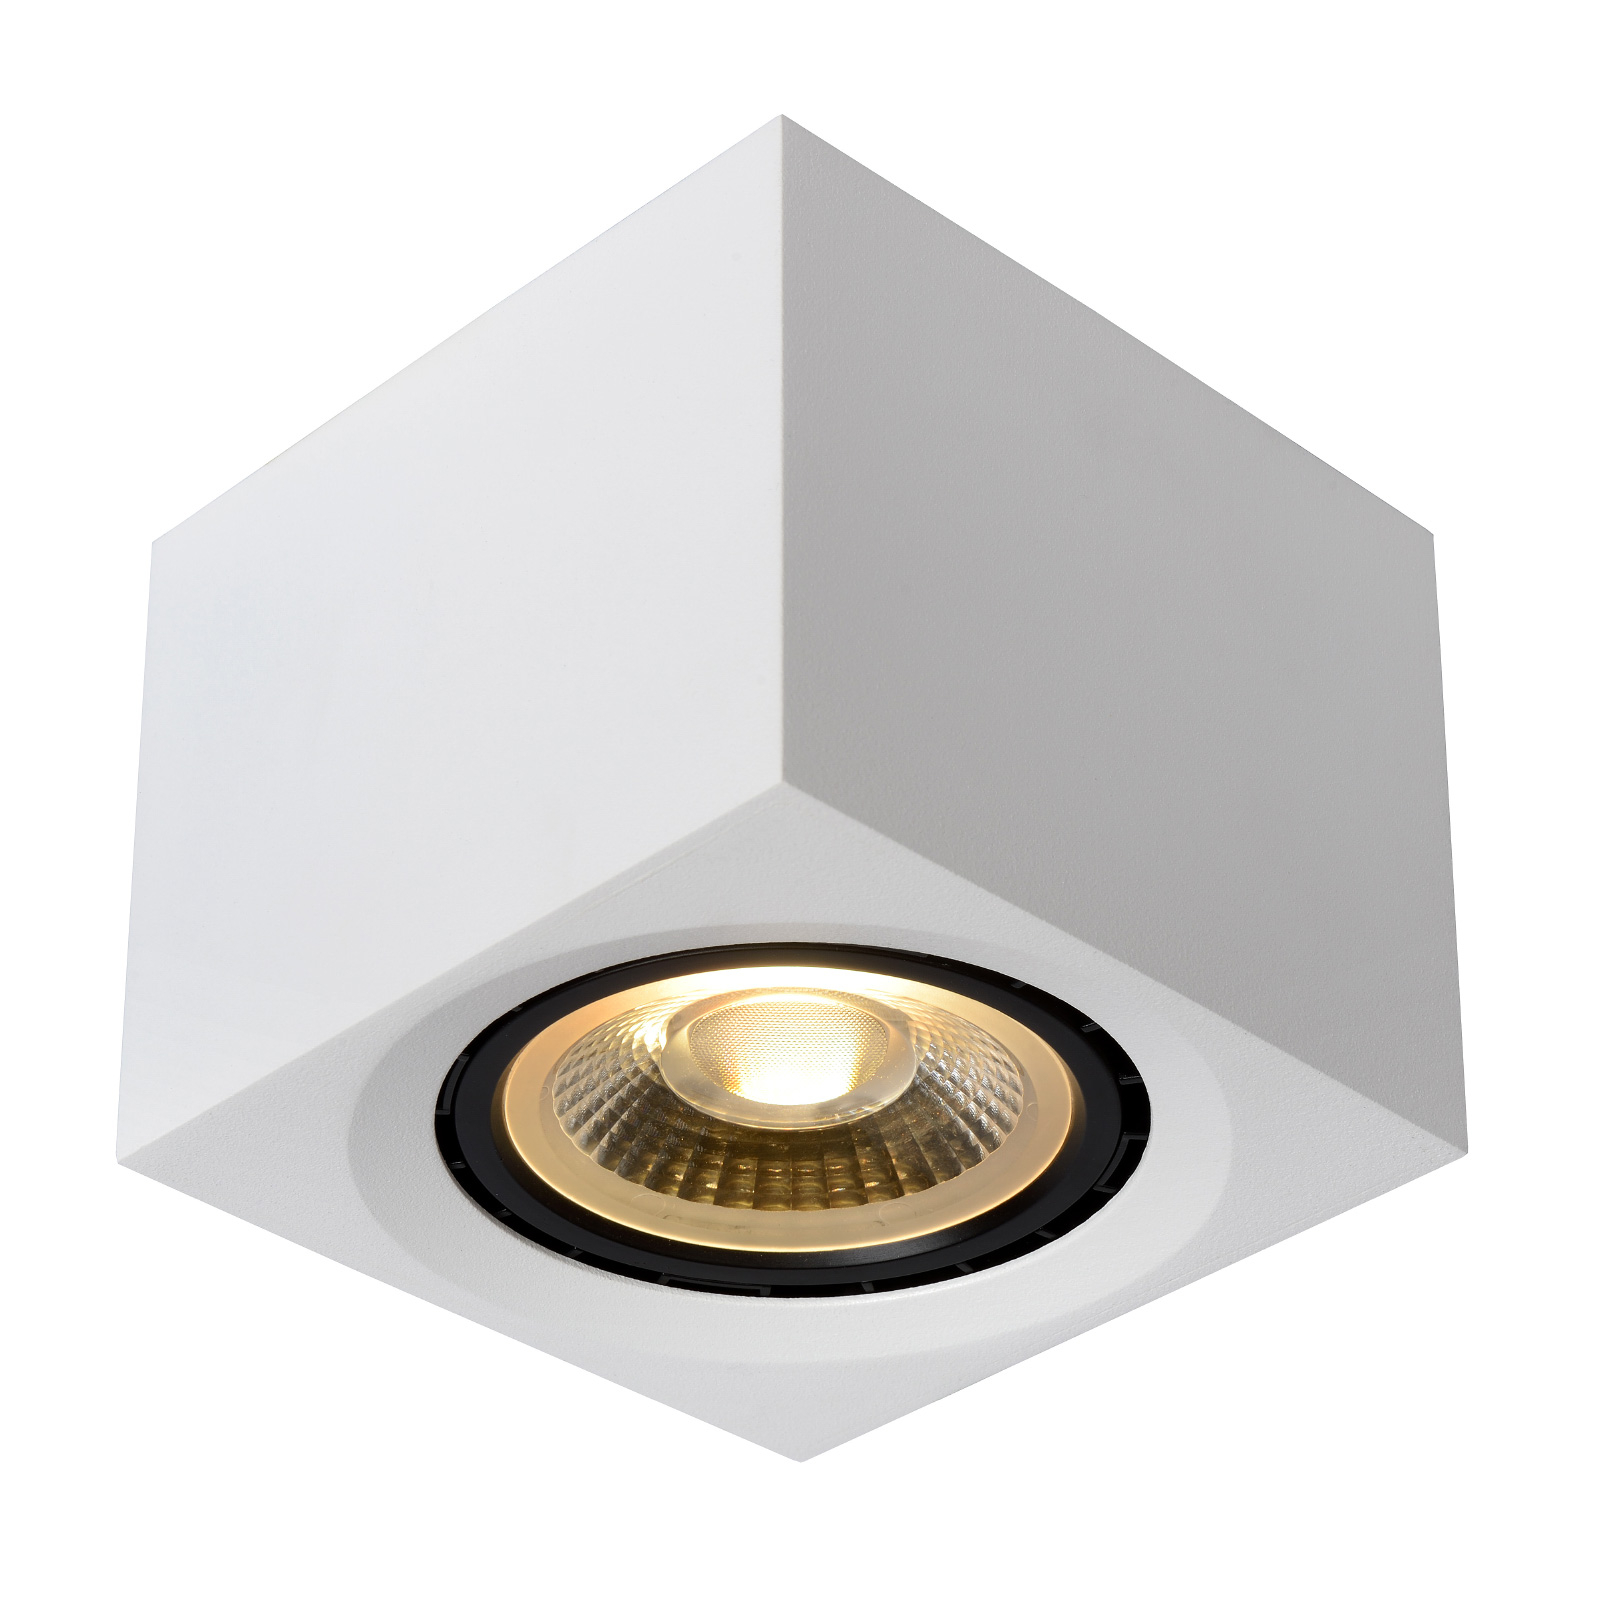 Spot LED soffitto Fedler angolare bianco